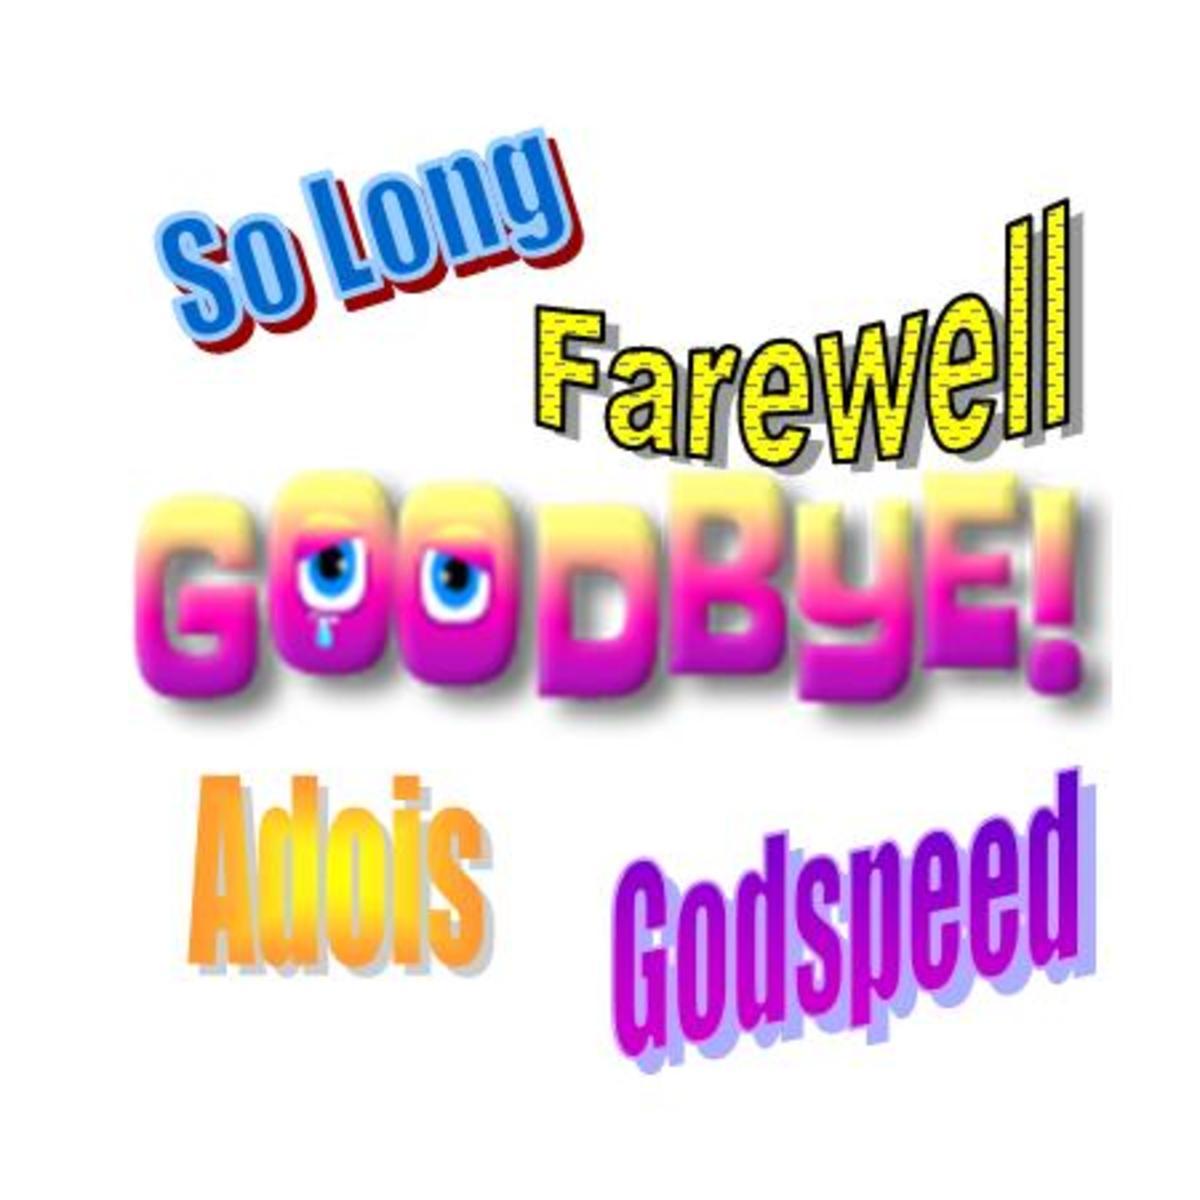 saying-goodbye-quotes-and-sayings